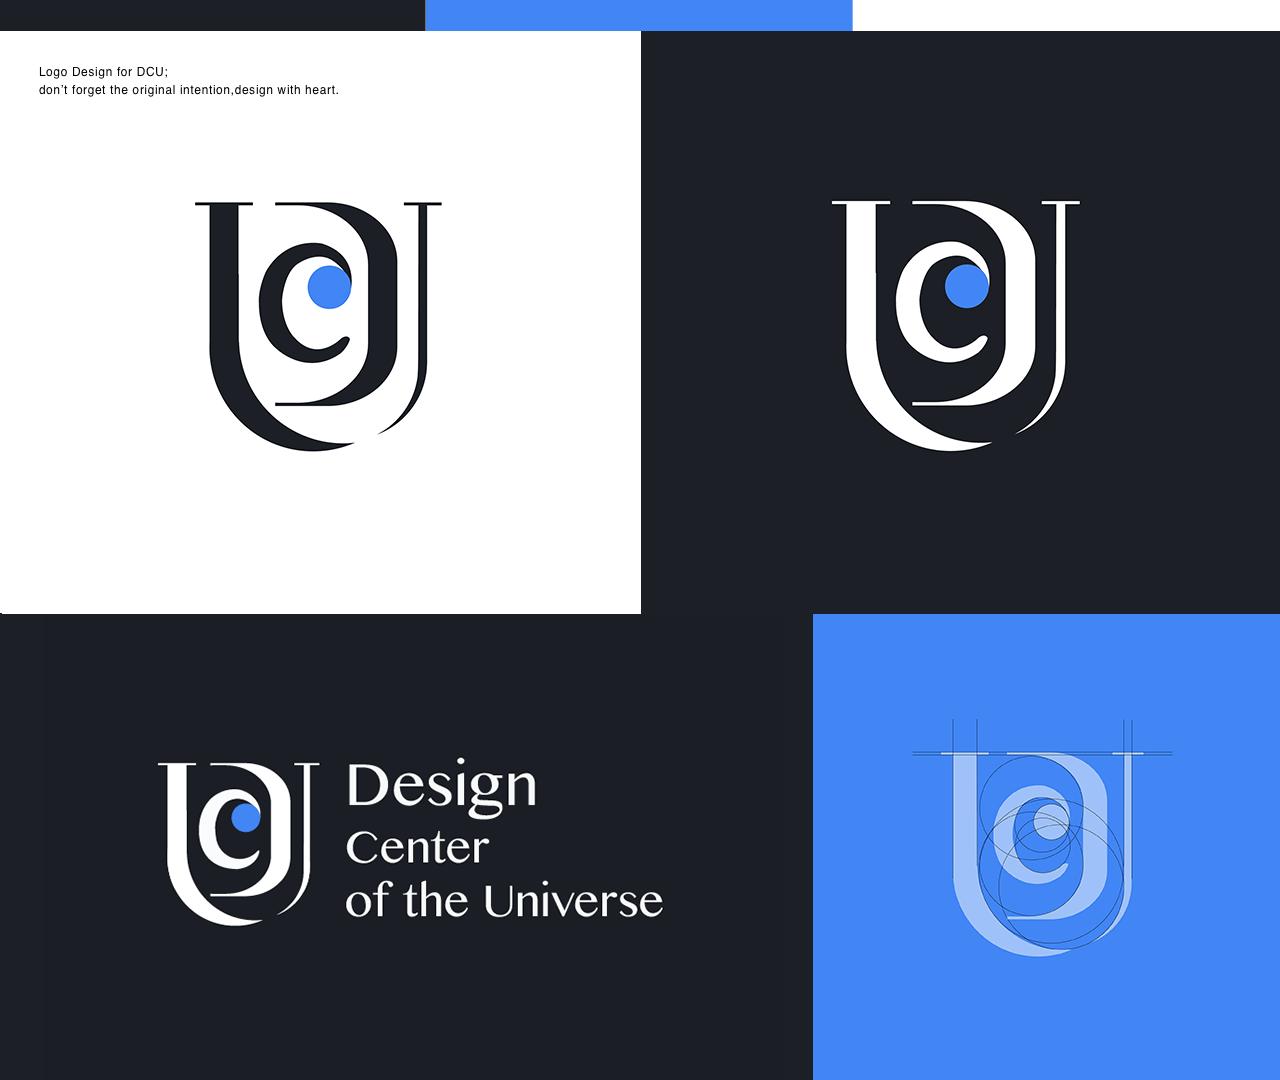 Dcu logo1